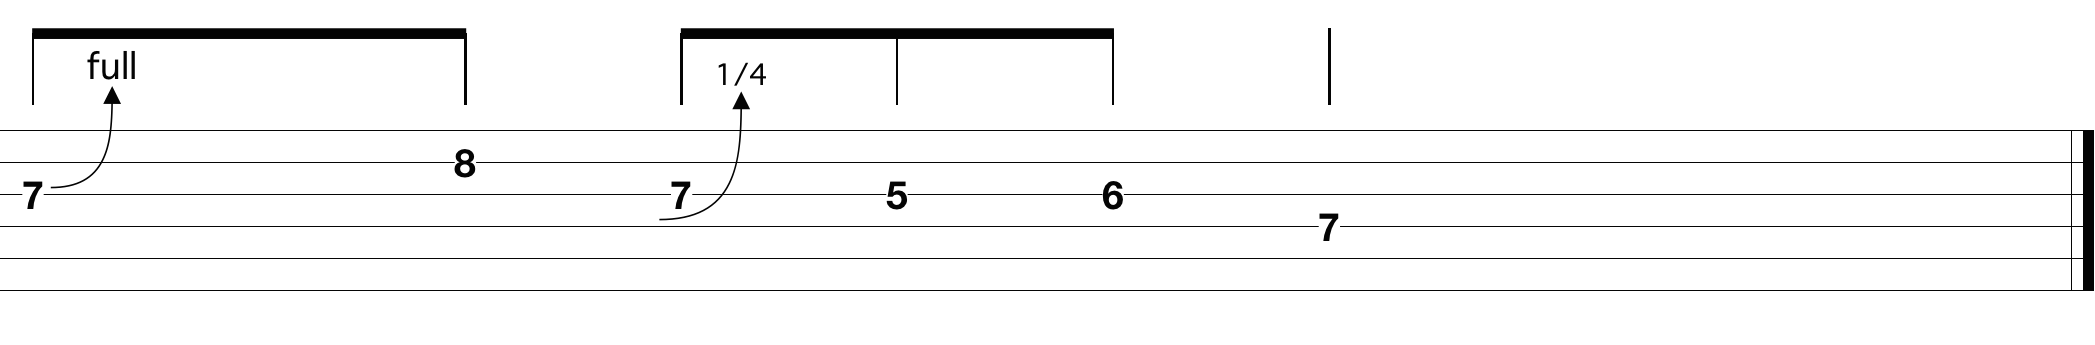 blues-tab-guitar_3.png